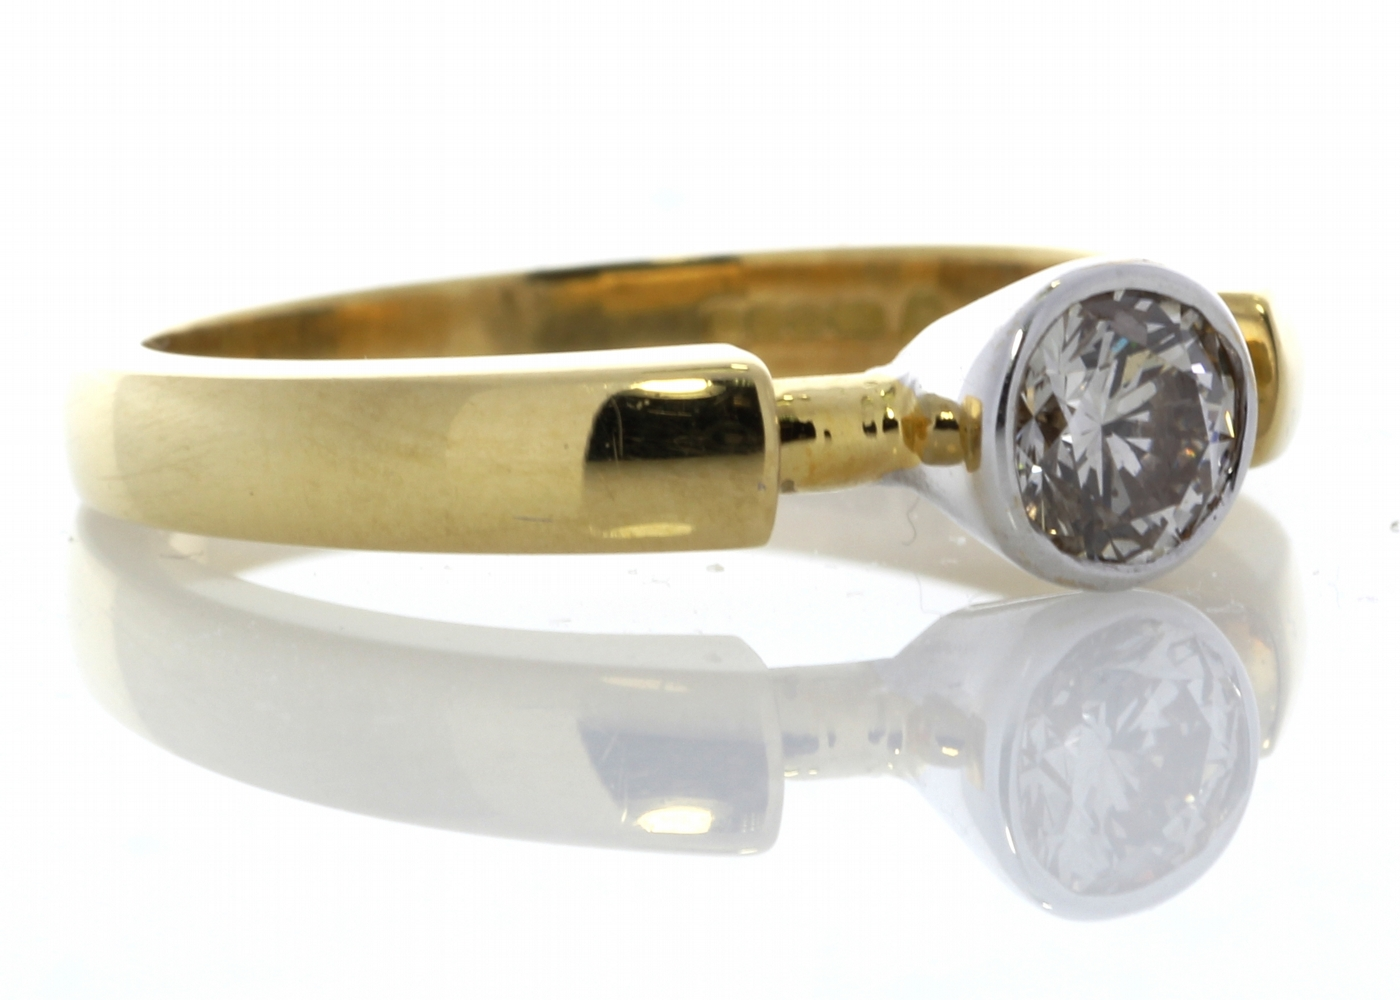 18ct Rub Over Set Diamond Ring 0.53 Carats - Image 4 of 5